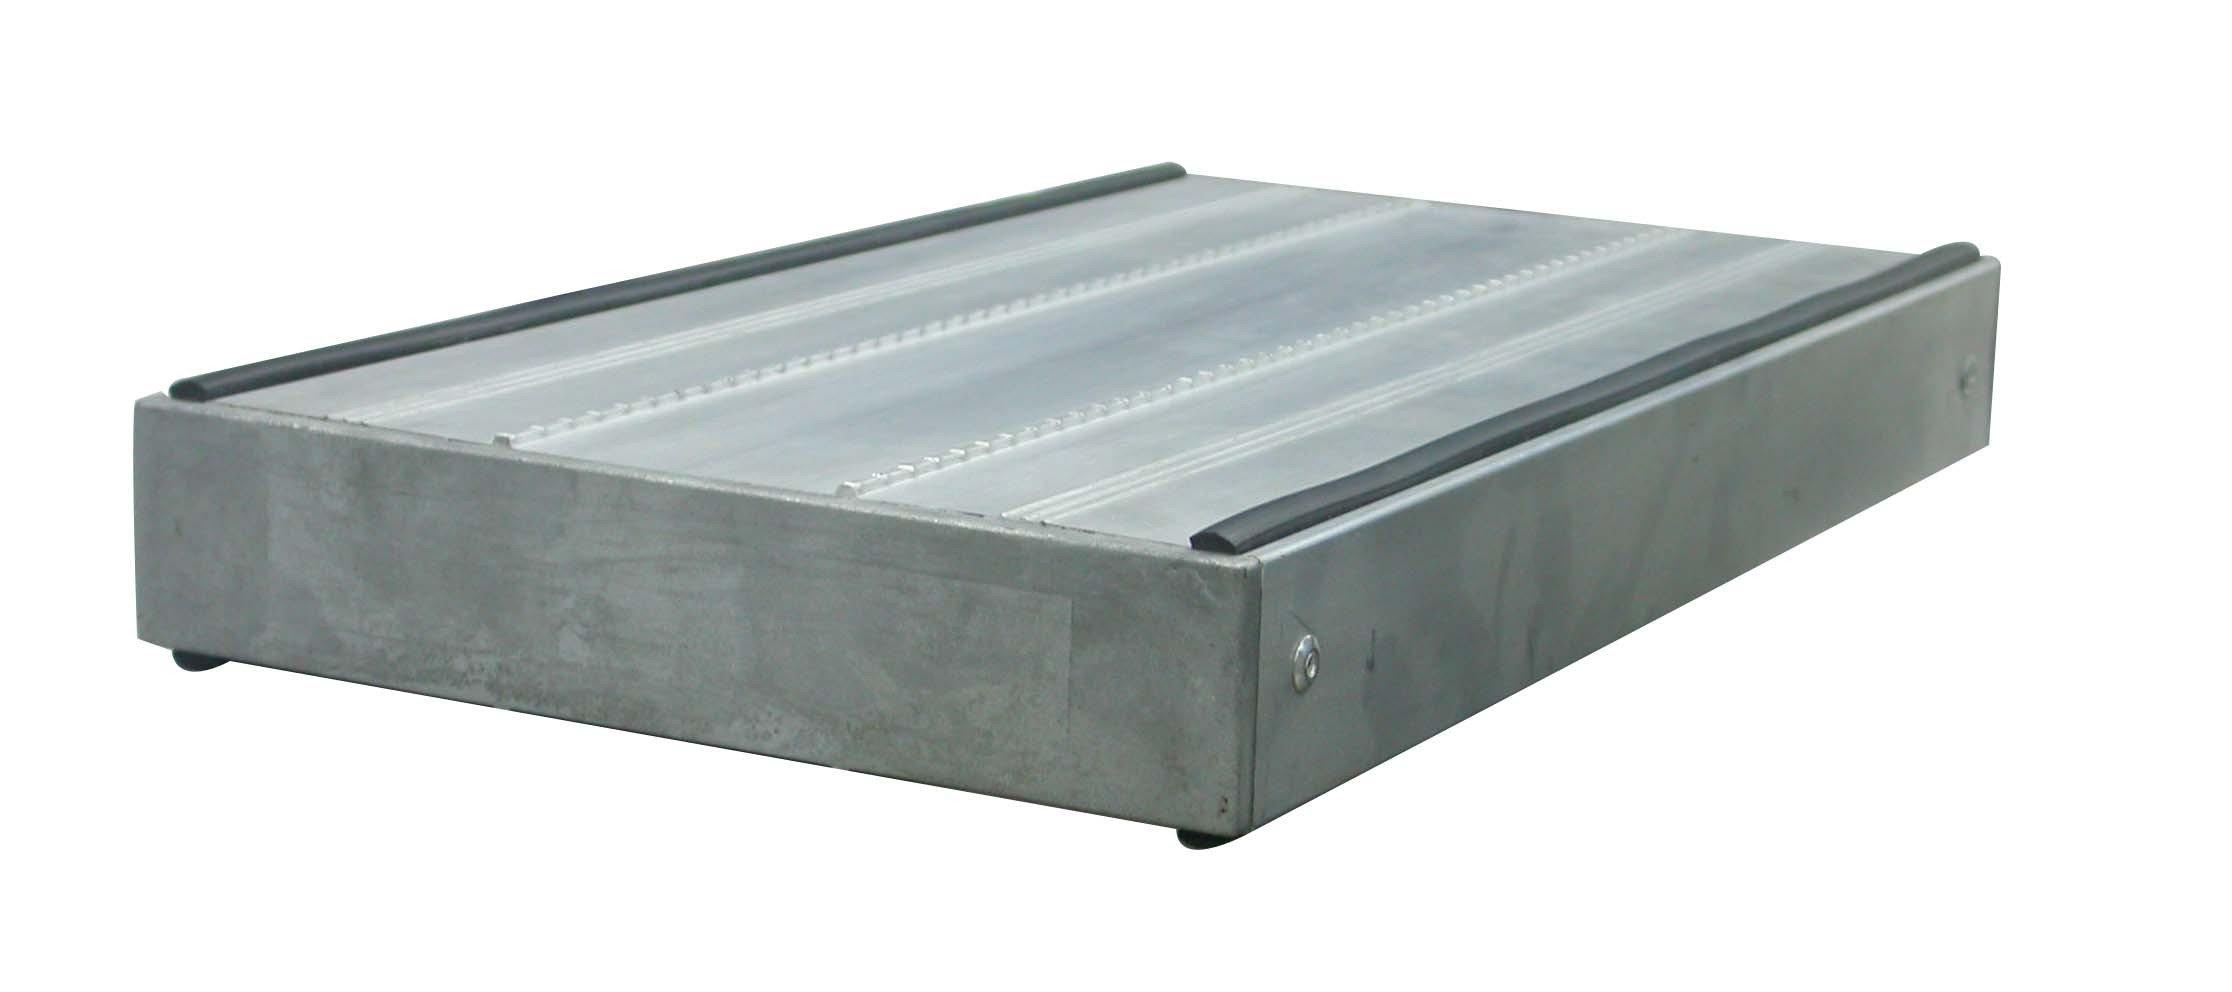 Aluminum Scaffold Planks : Aluminium scaffold planks buy plank product on